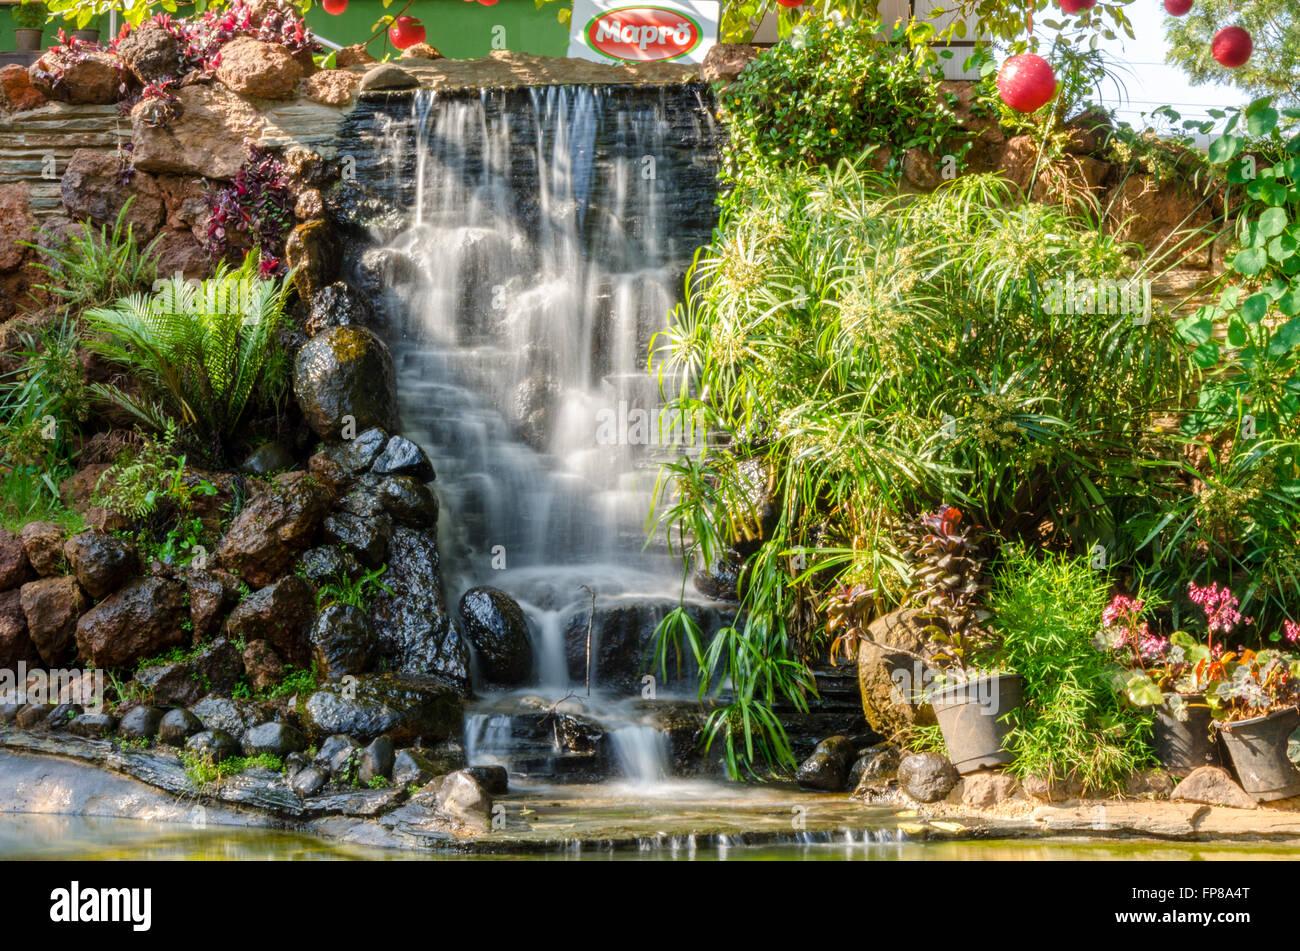 Small Waterfall At Mapro Garden Panchgani Maharashtra India Stock Photo Alamy